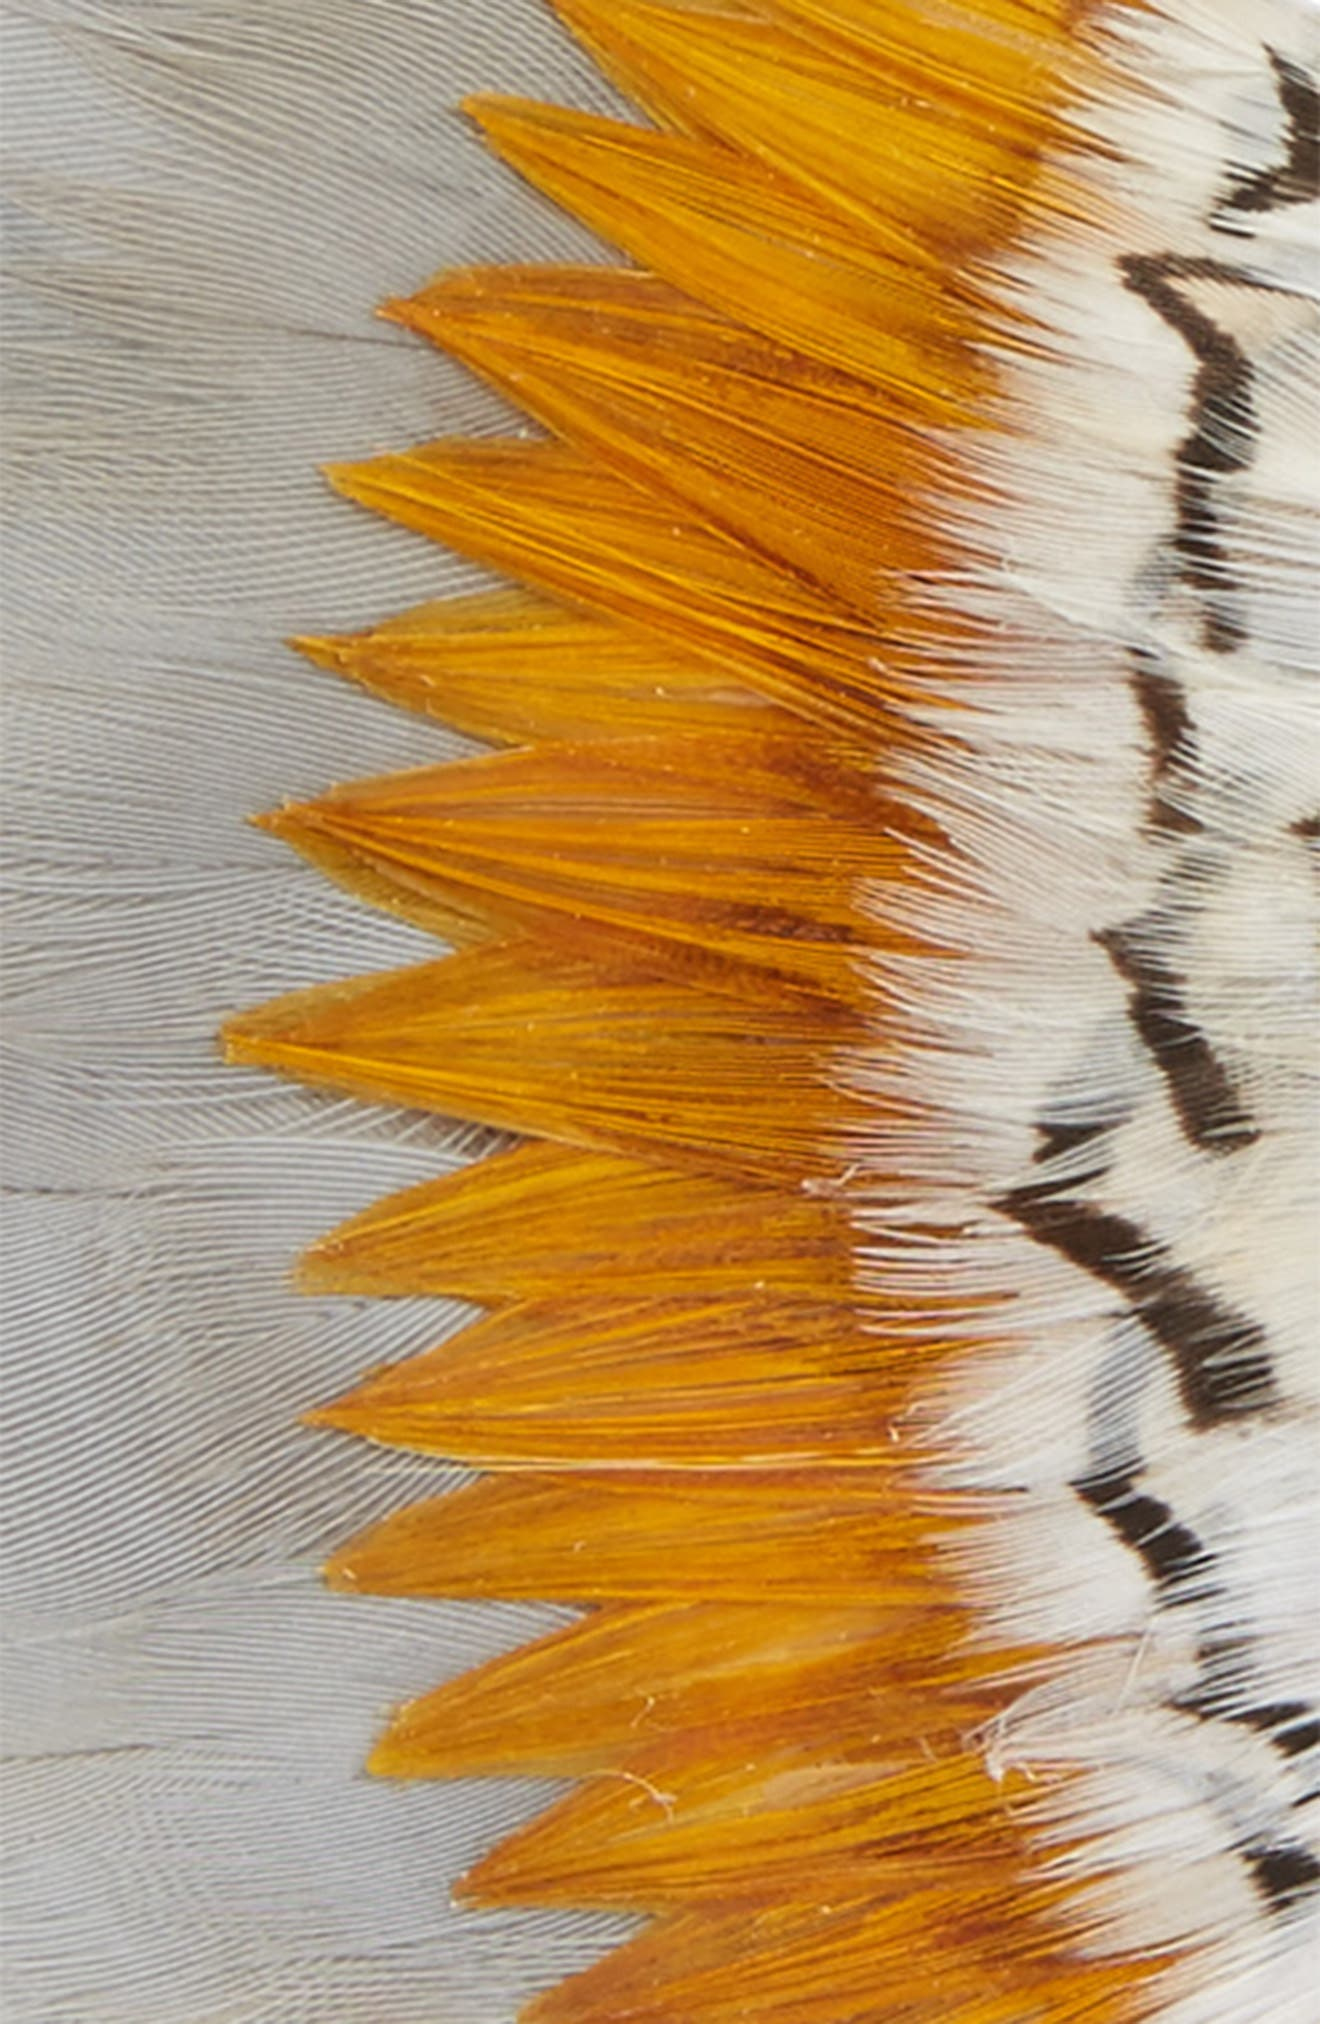 Brackish & Bell Stono Feather Bow Tie,                             Alternate thumbnail 2, color,                             YELLOW/ GREY